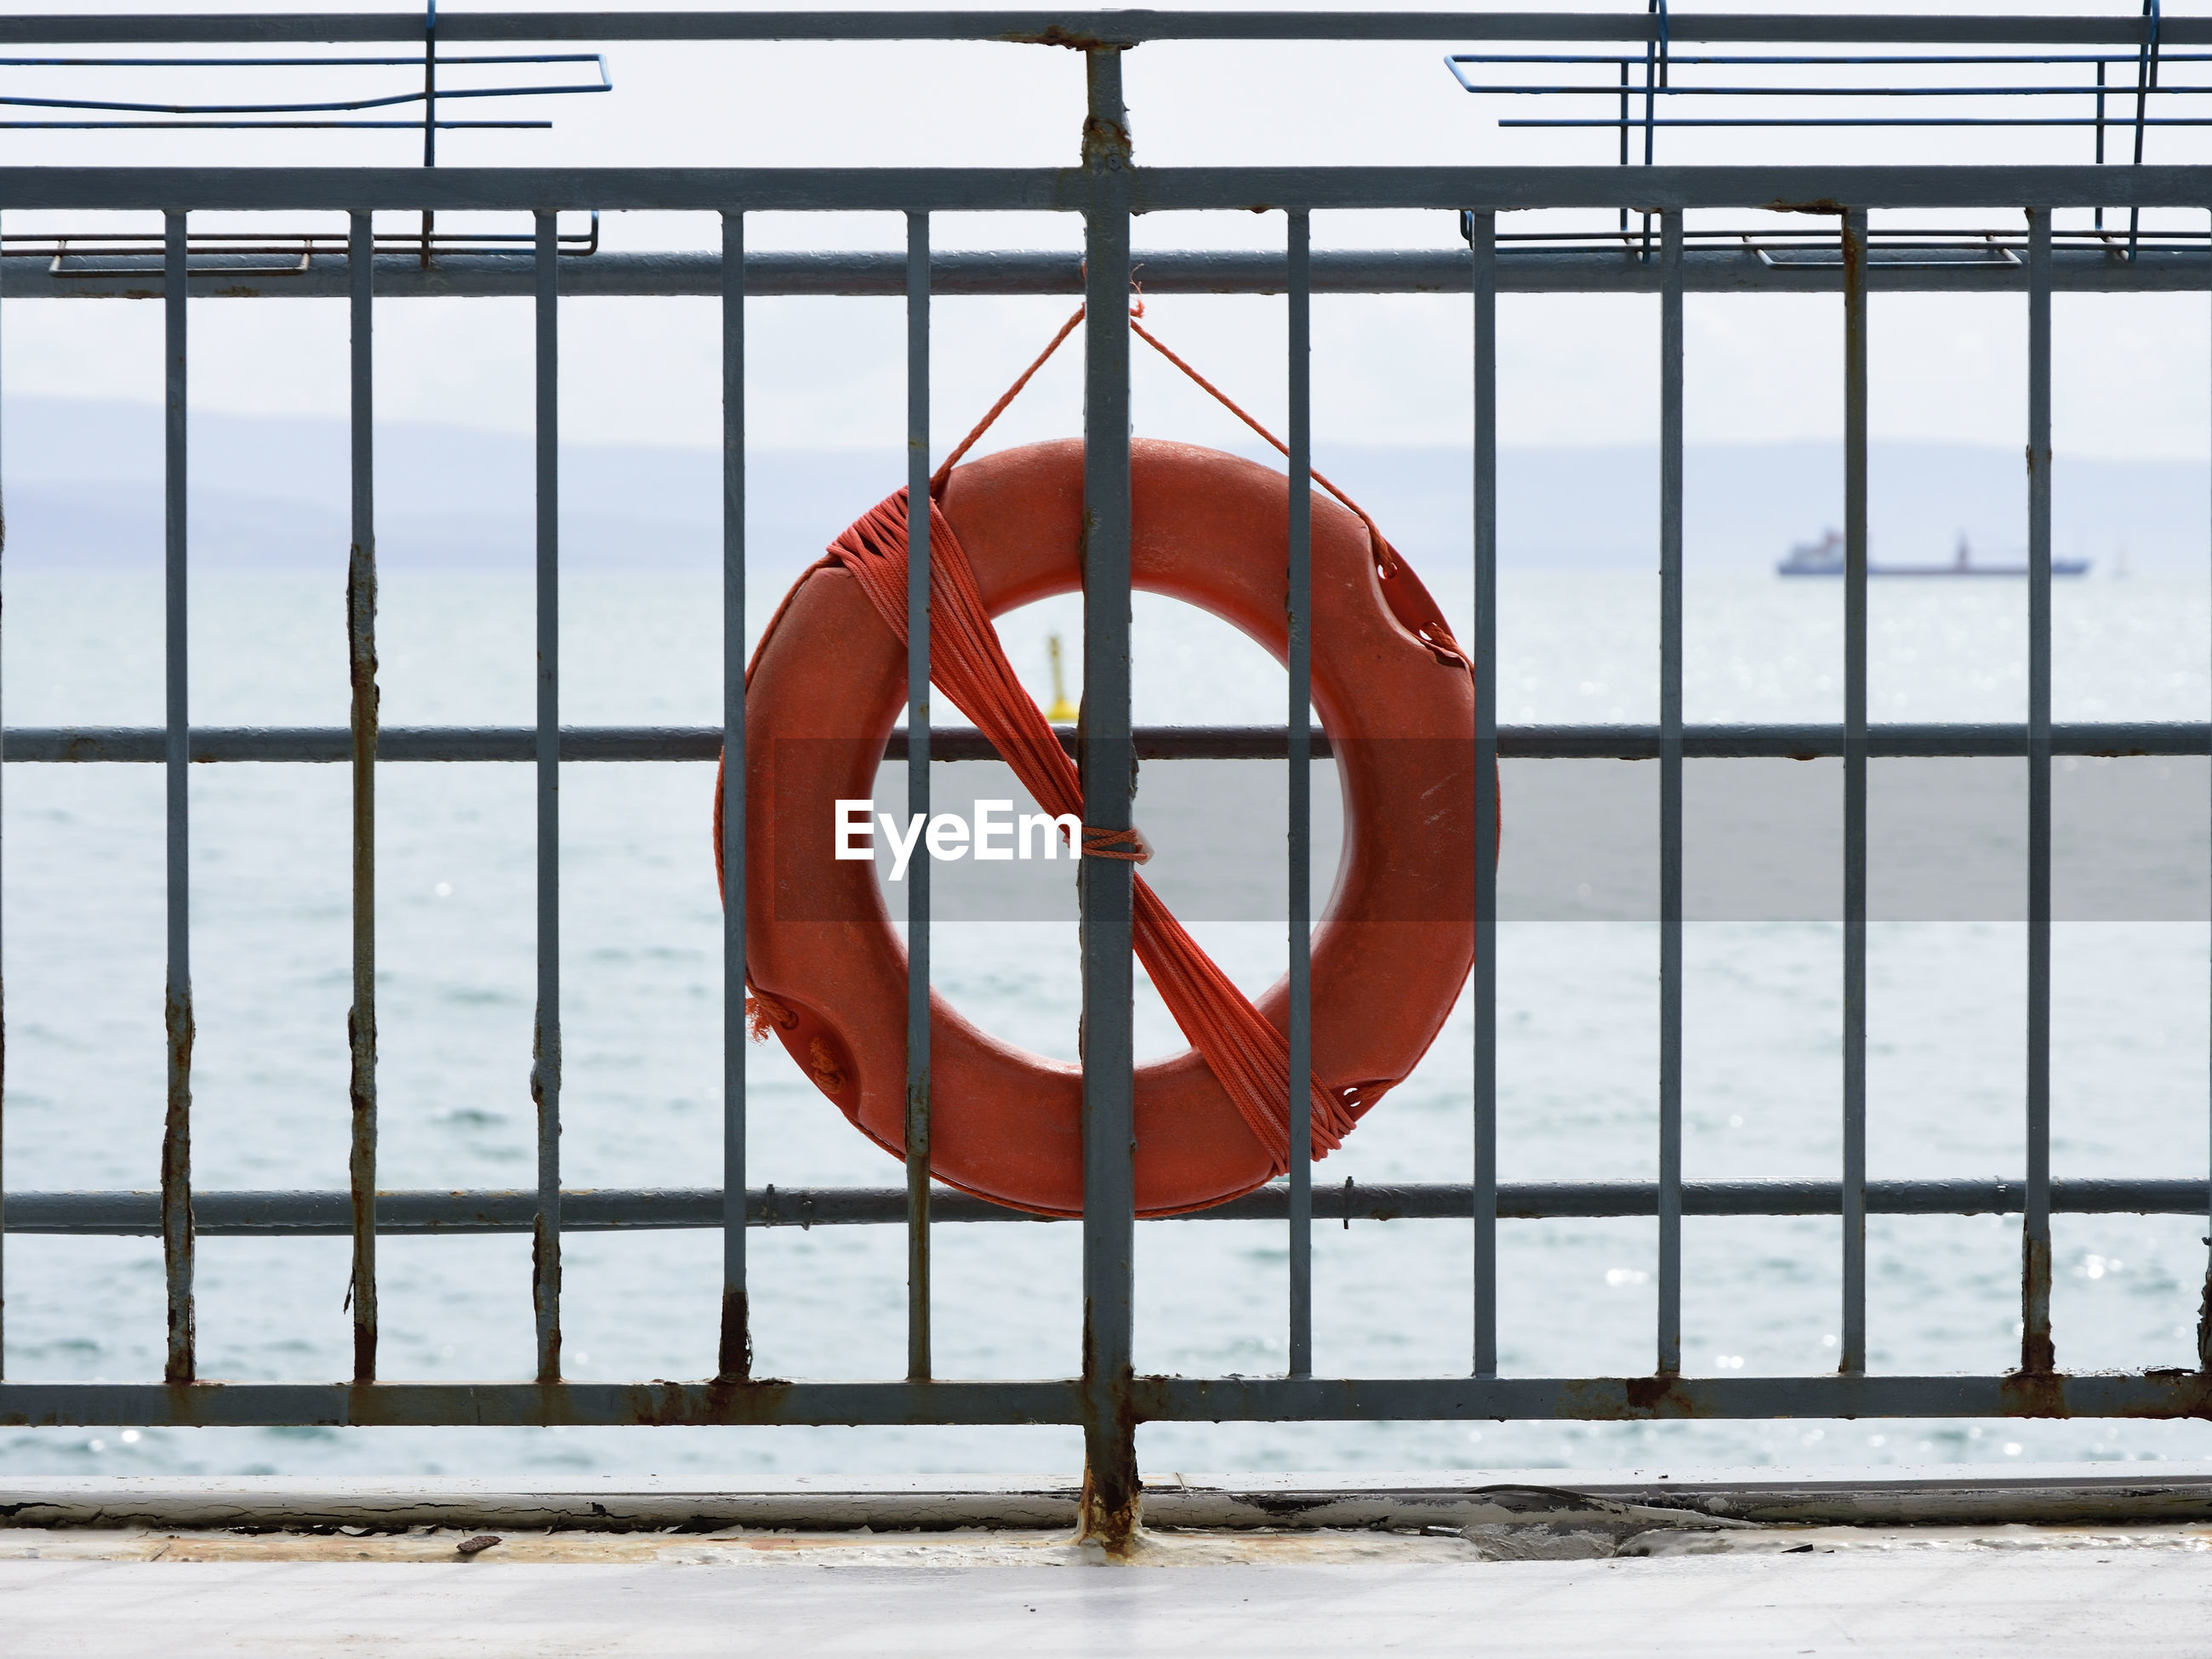 Life belt hanging on railing against sea